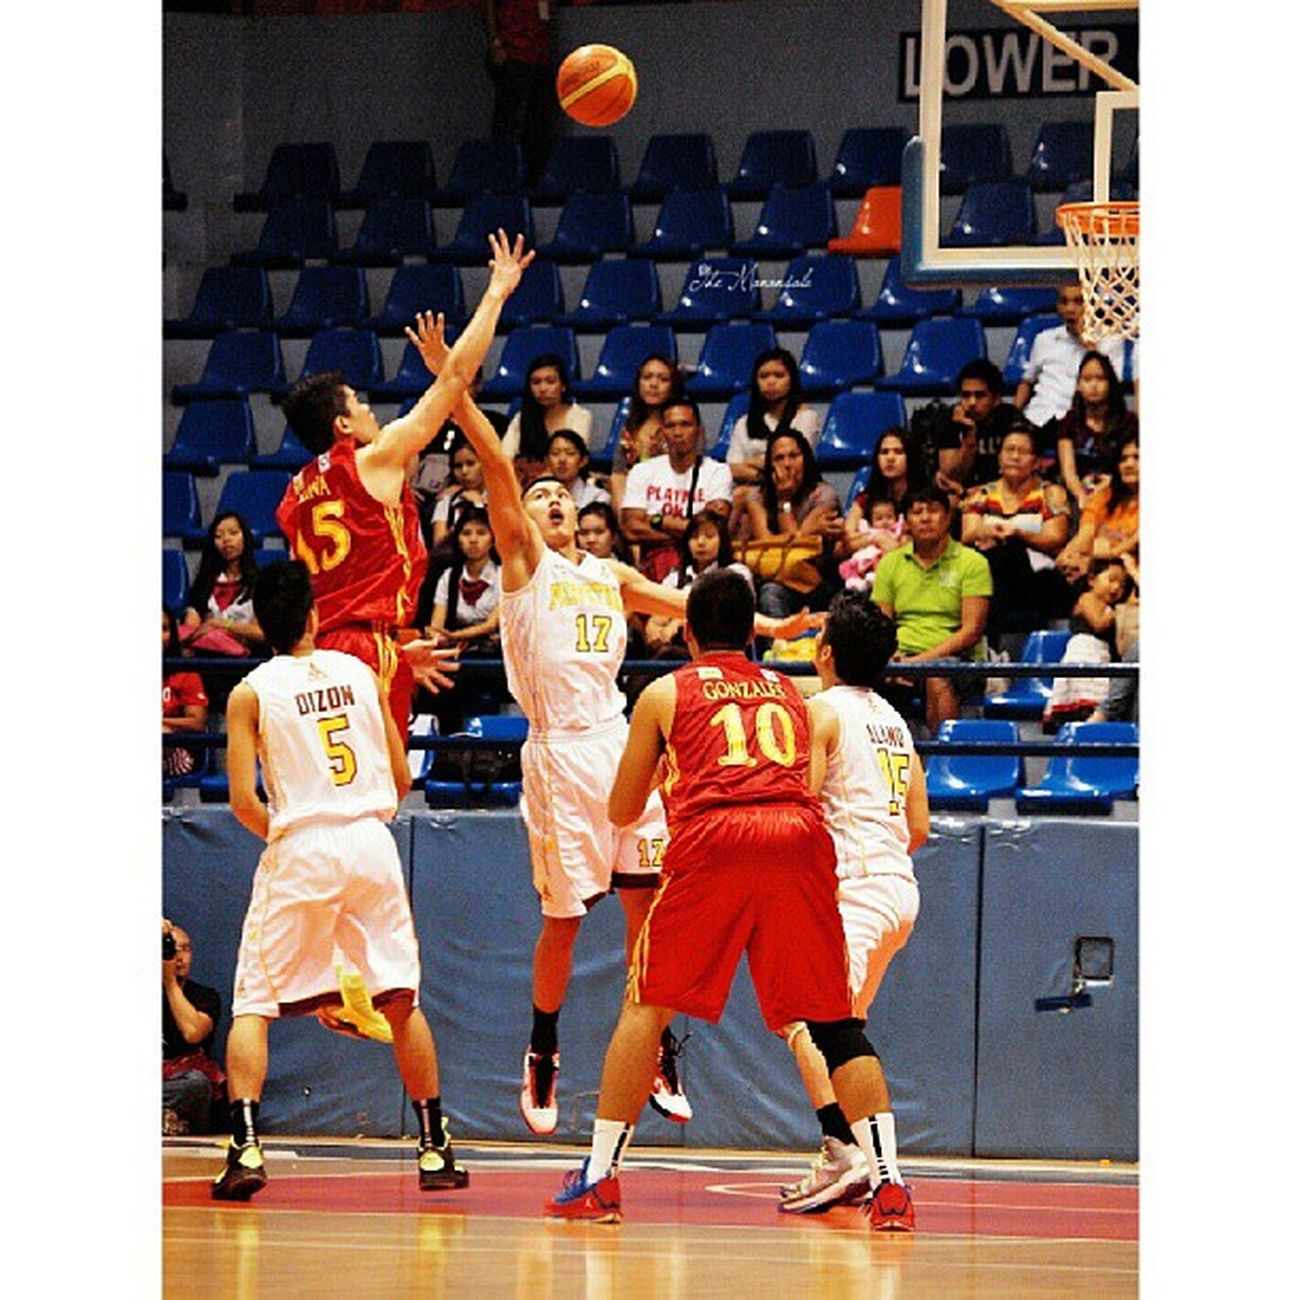 Mark Jayson Brana @mjbrana Ncaa89 MITvsUPHSD Mapuacardinals Mapua mjbrana basketball themanansala photography